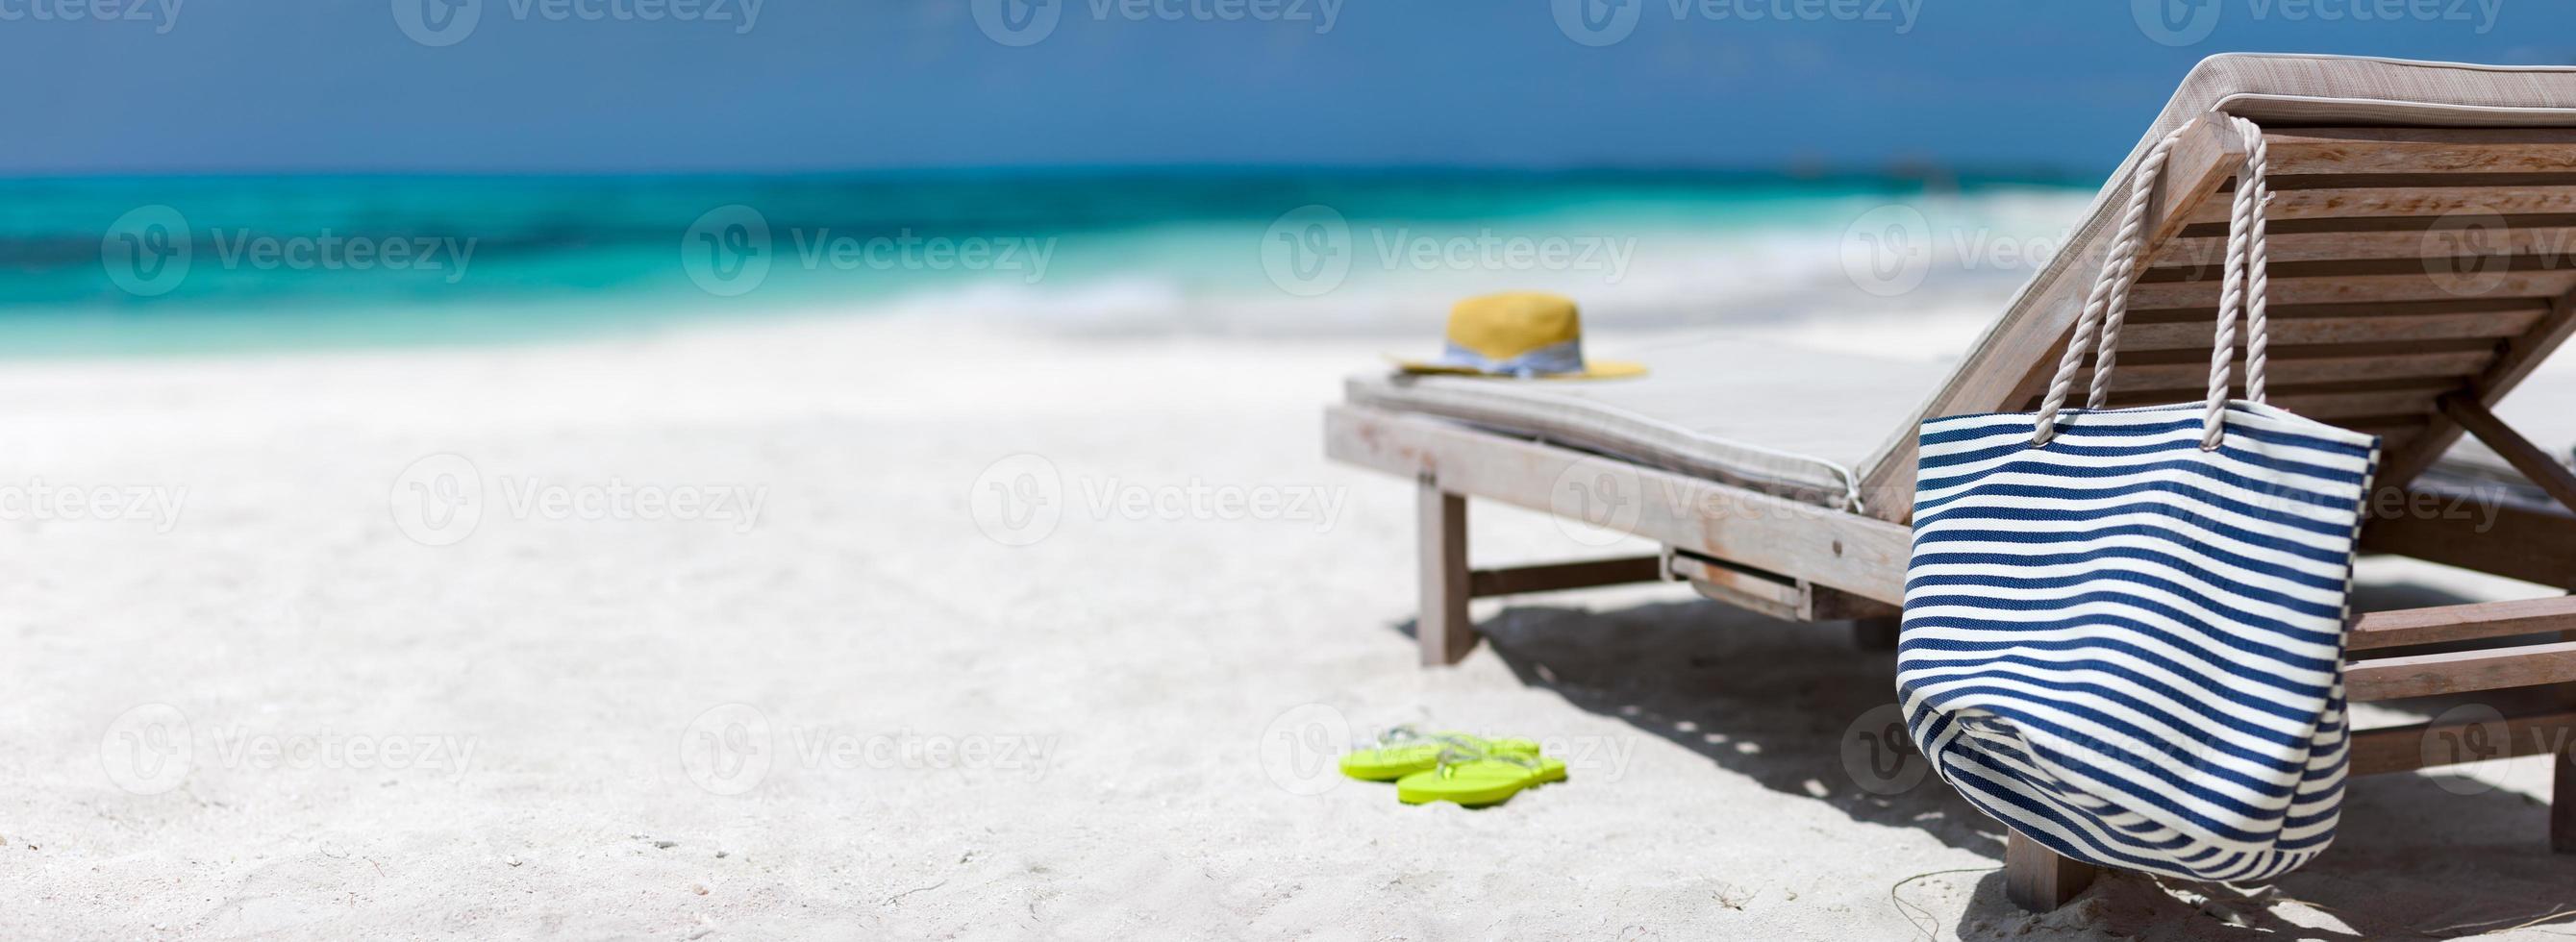 Tropical beach vacation photo